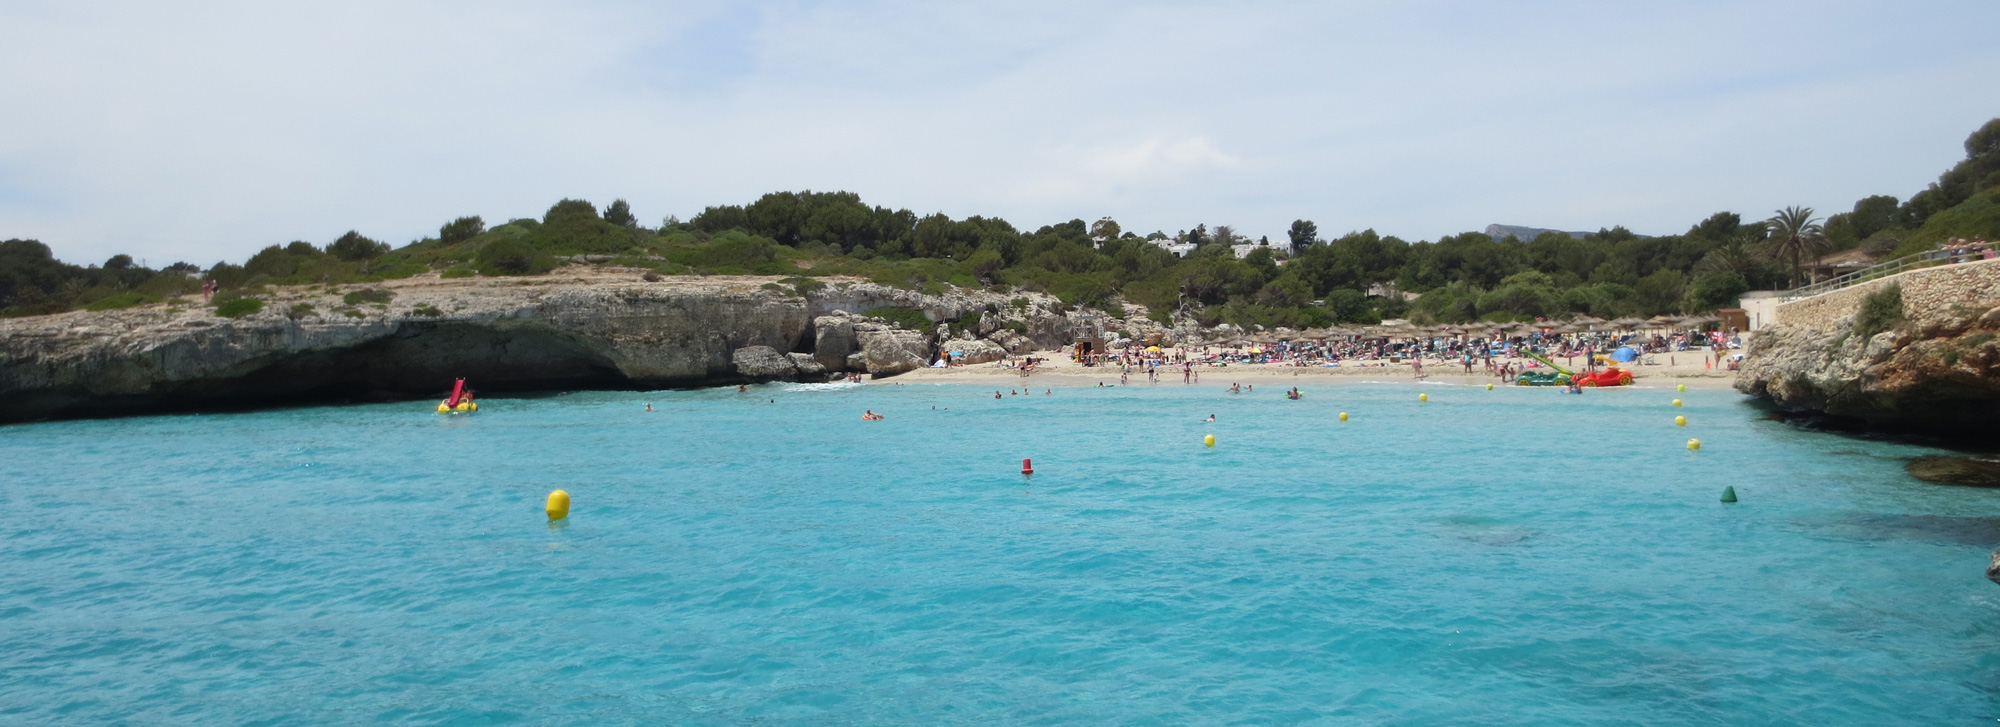 Calas De Mallorca Hotels